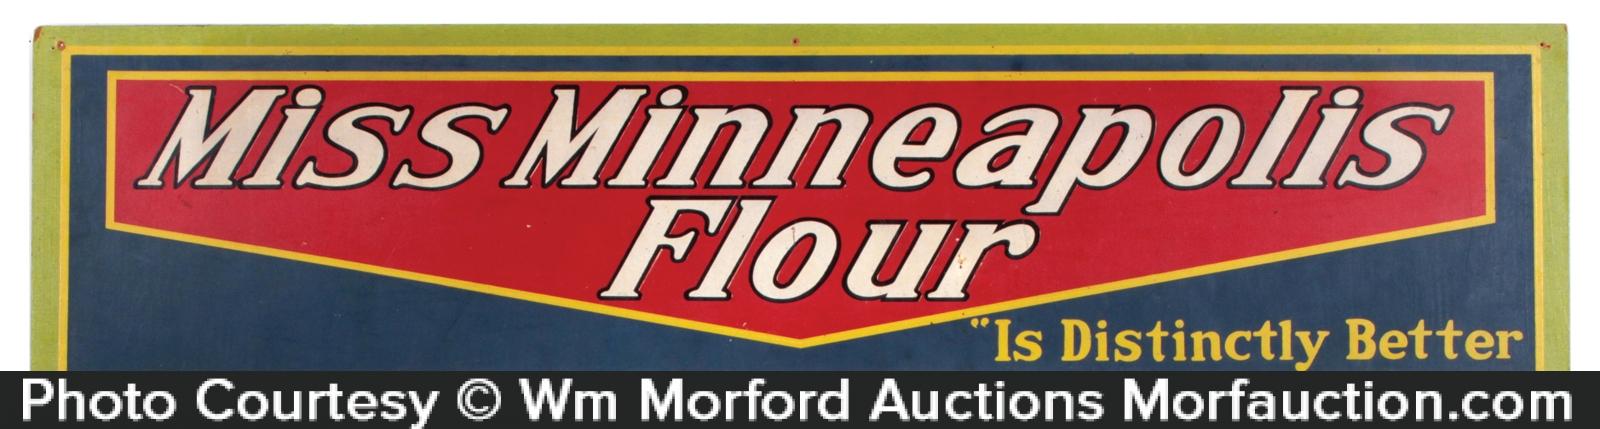 Miss Minneapolis Flour Sign